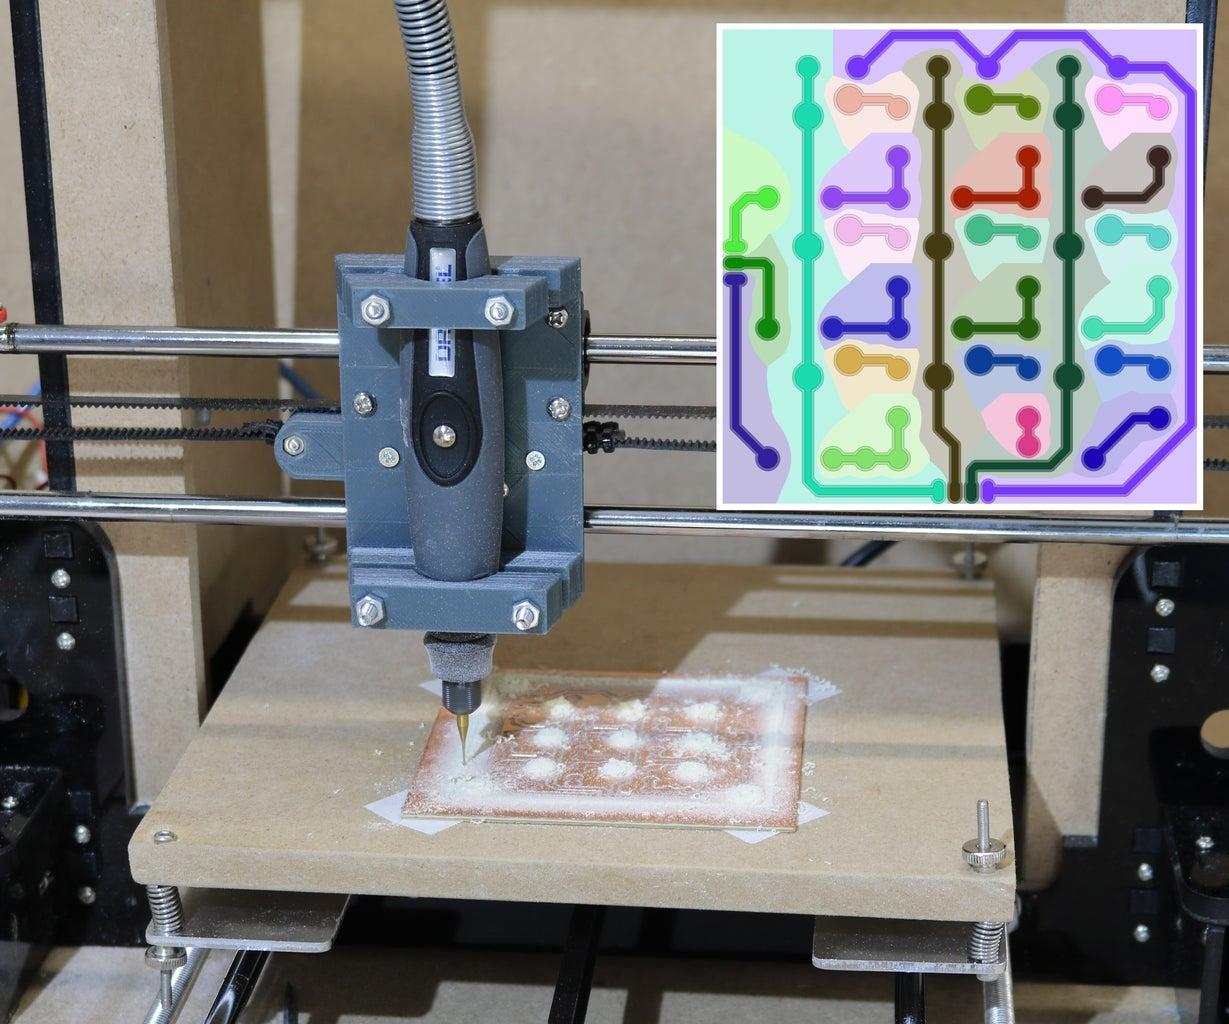 PCB Milling Using a 3D Printer